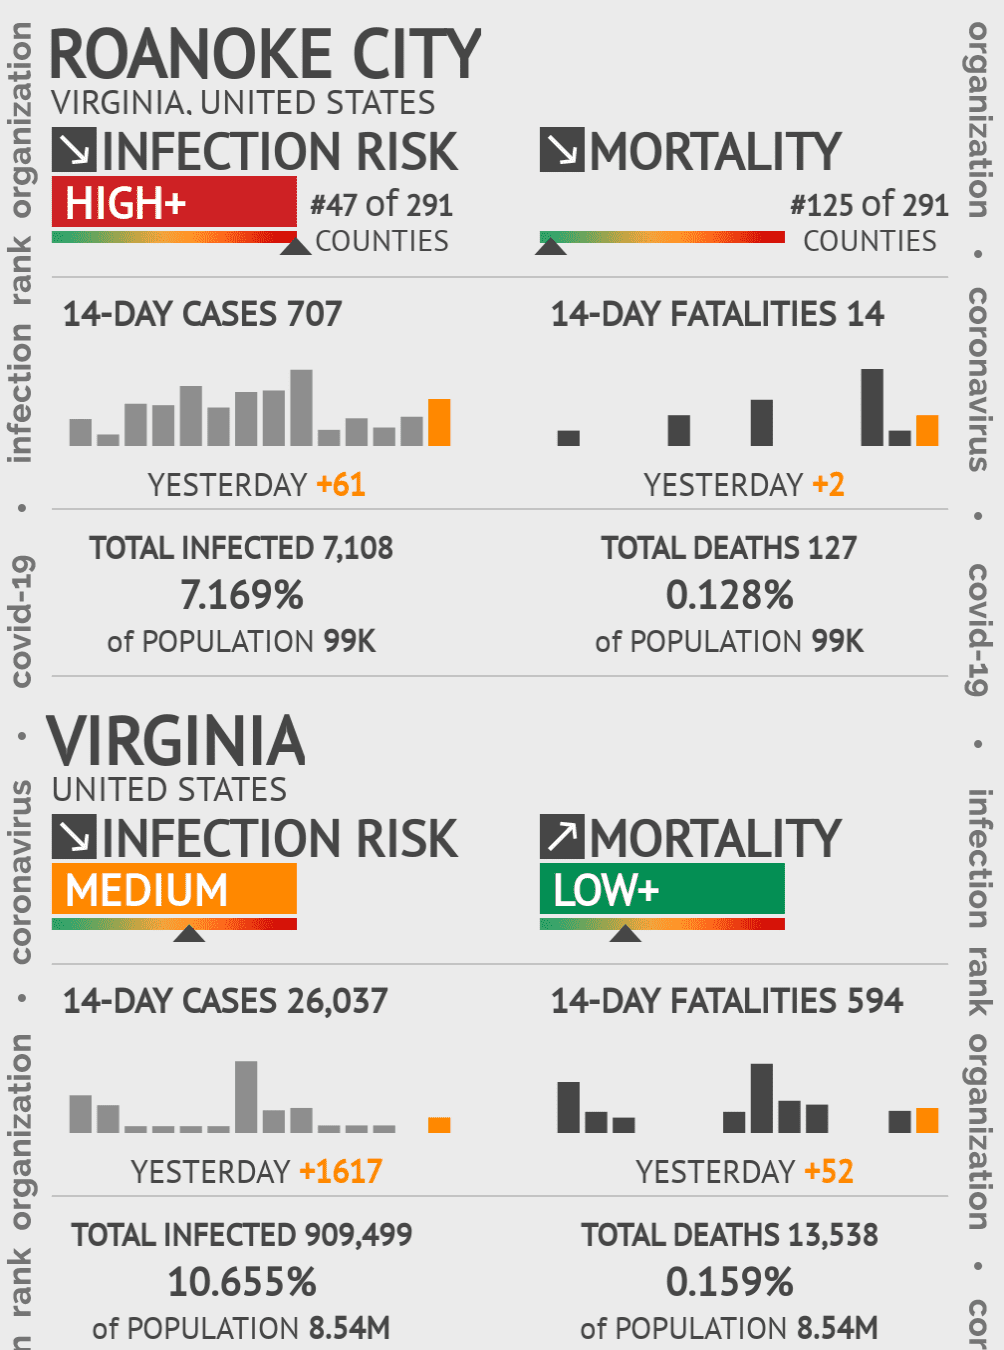 Roanoke City Coronavirus Covid-19 Risk of Infection on February 04, 2021